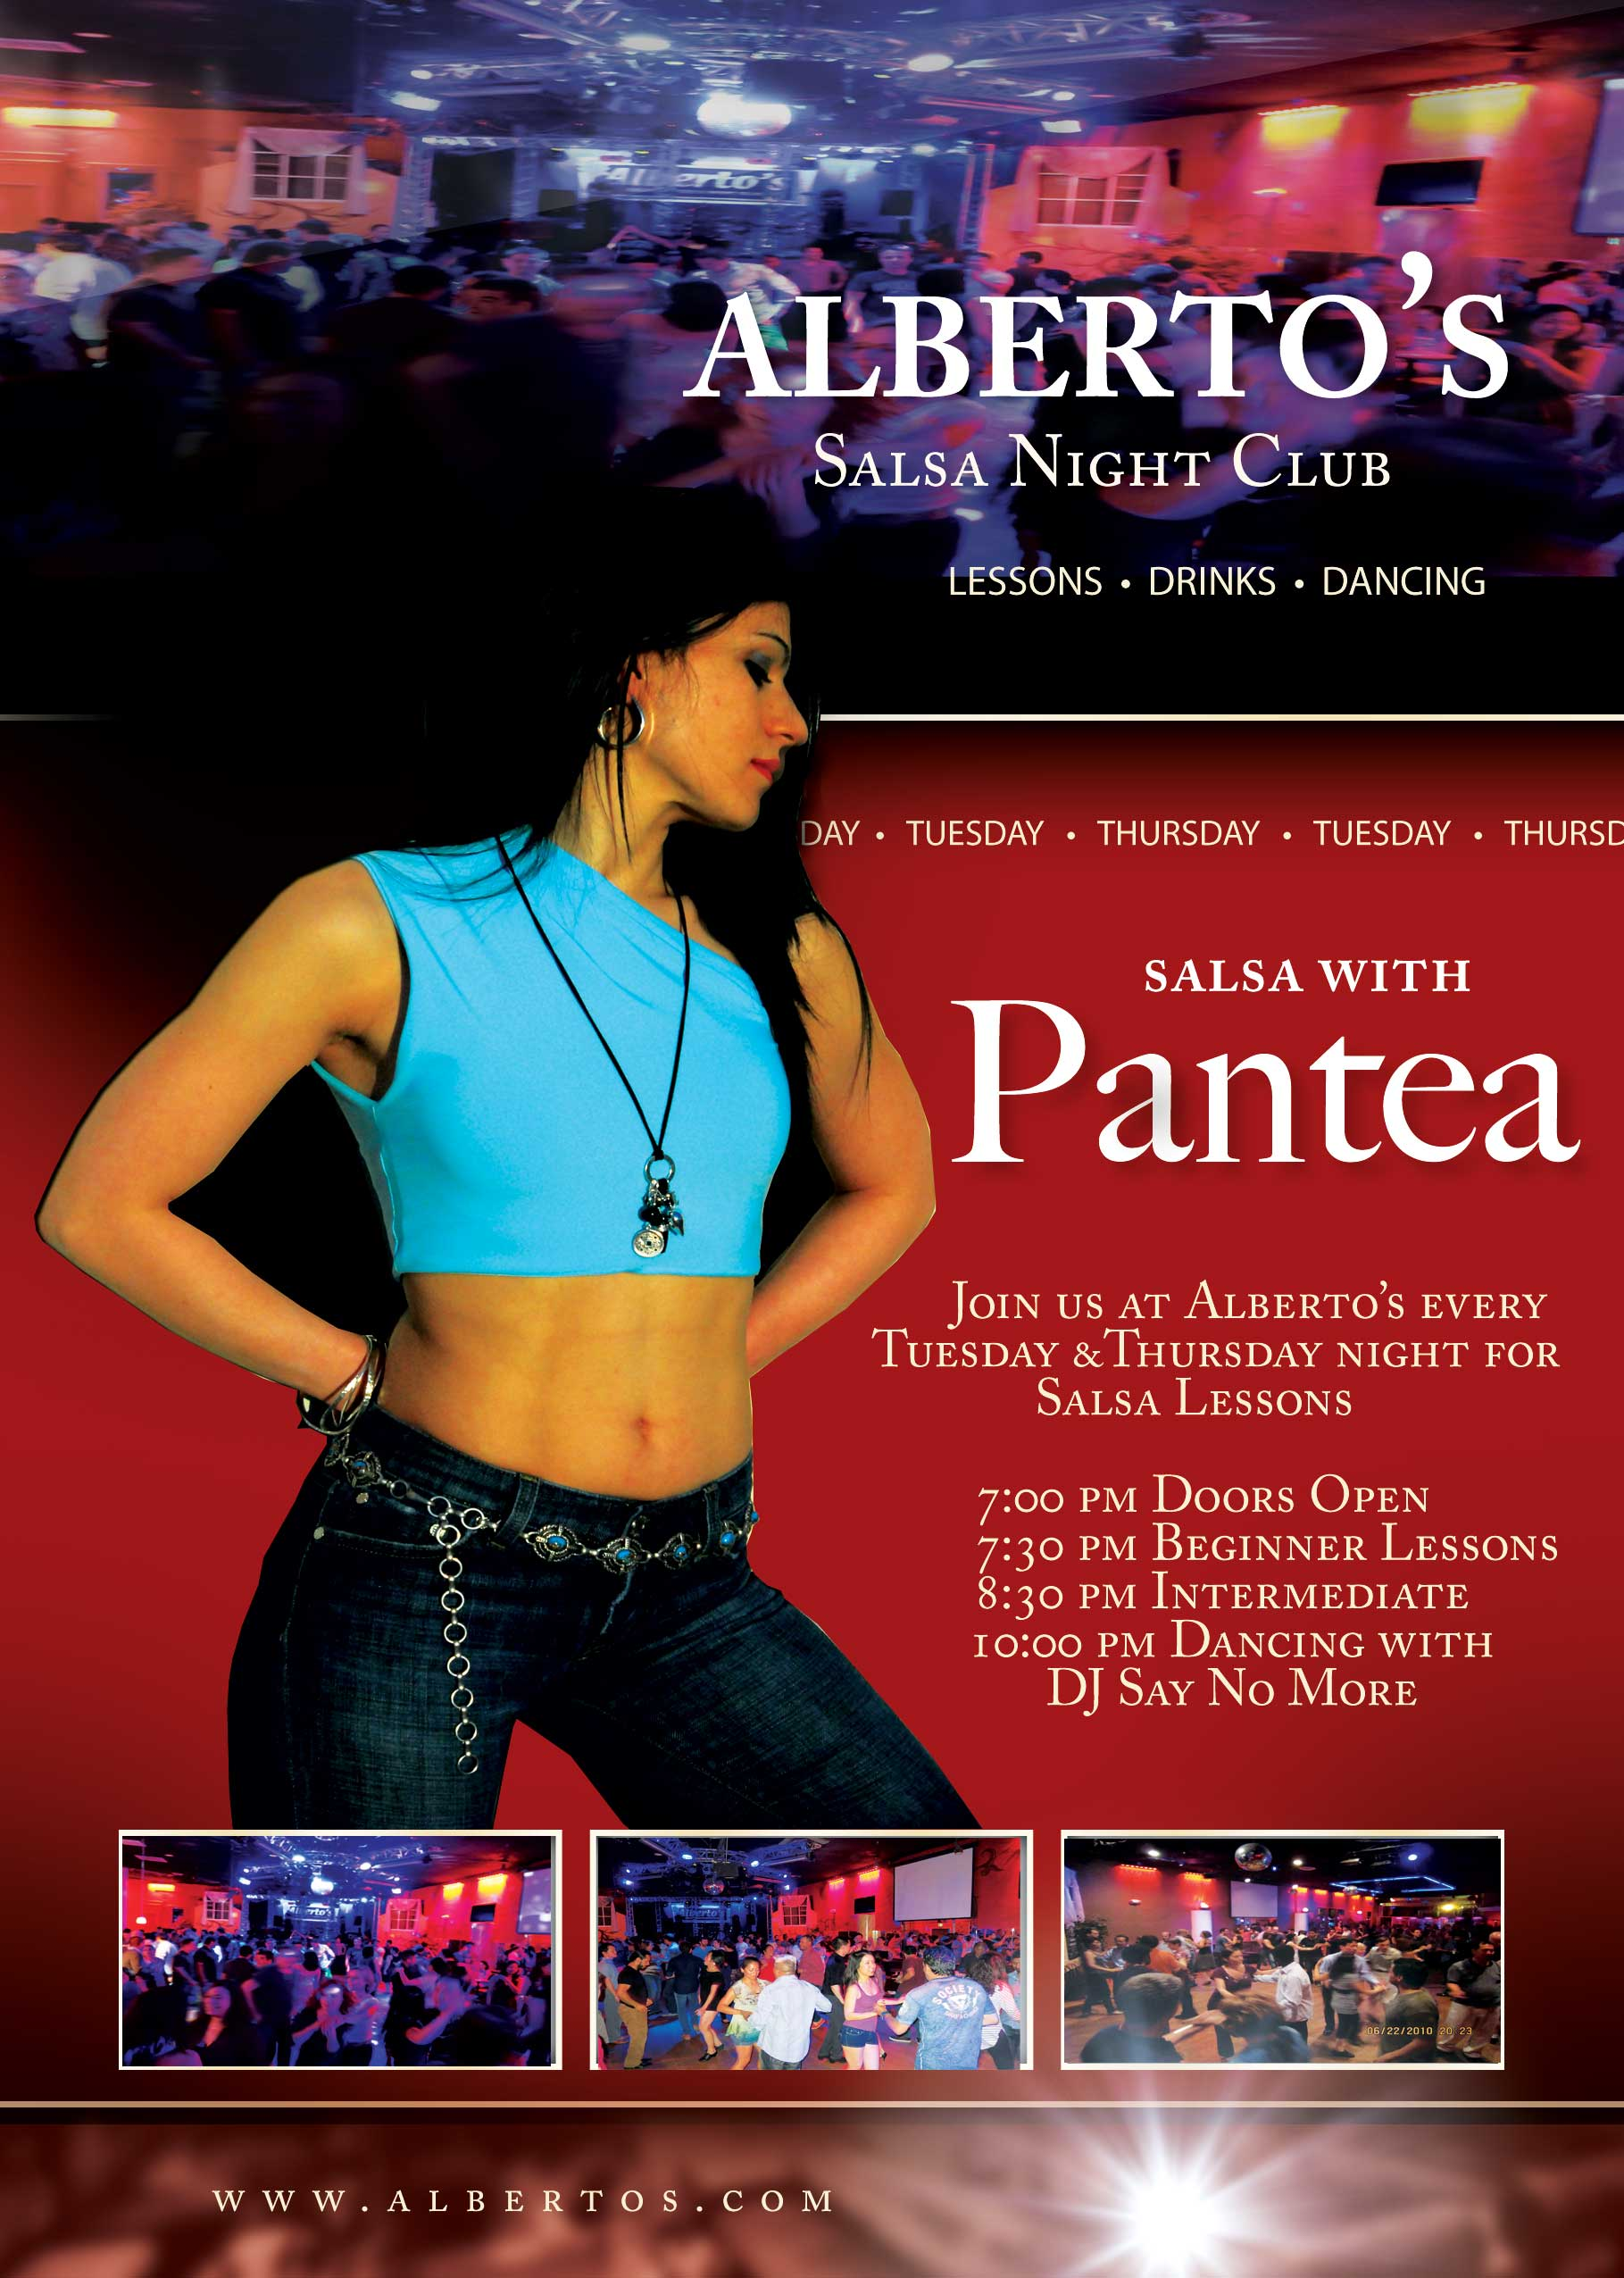 Albertos Salsa NightClub & Ultra Lounge